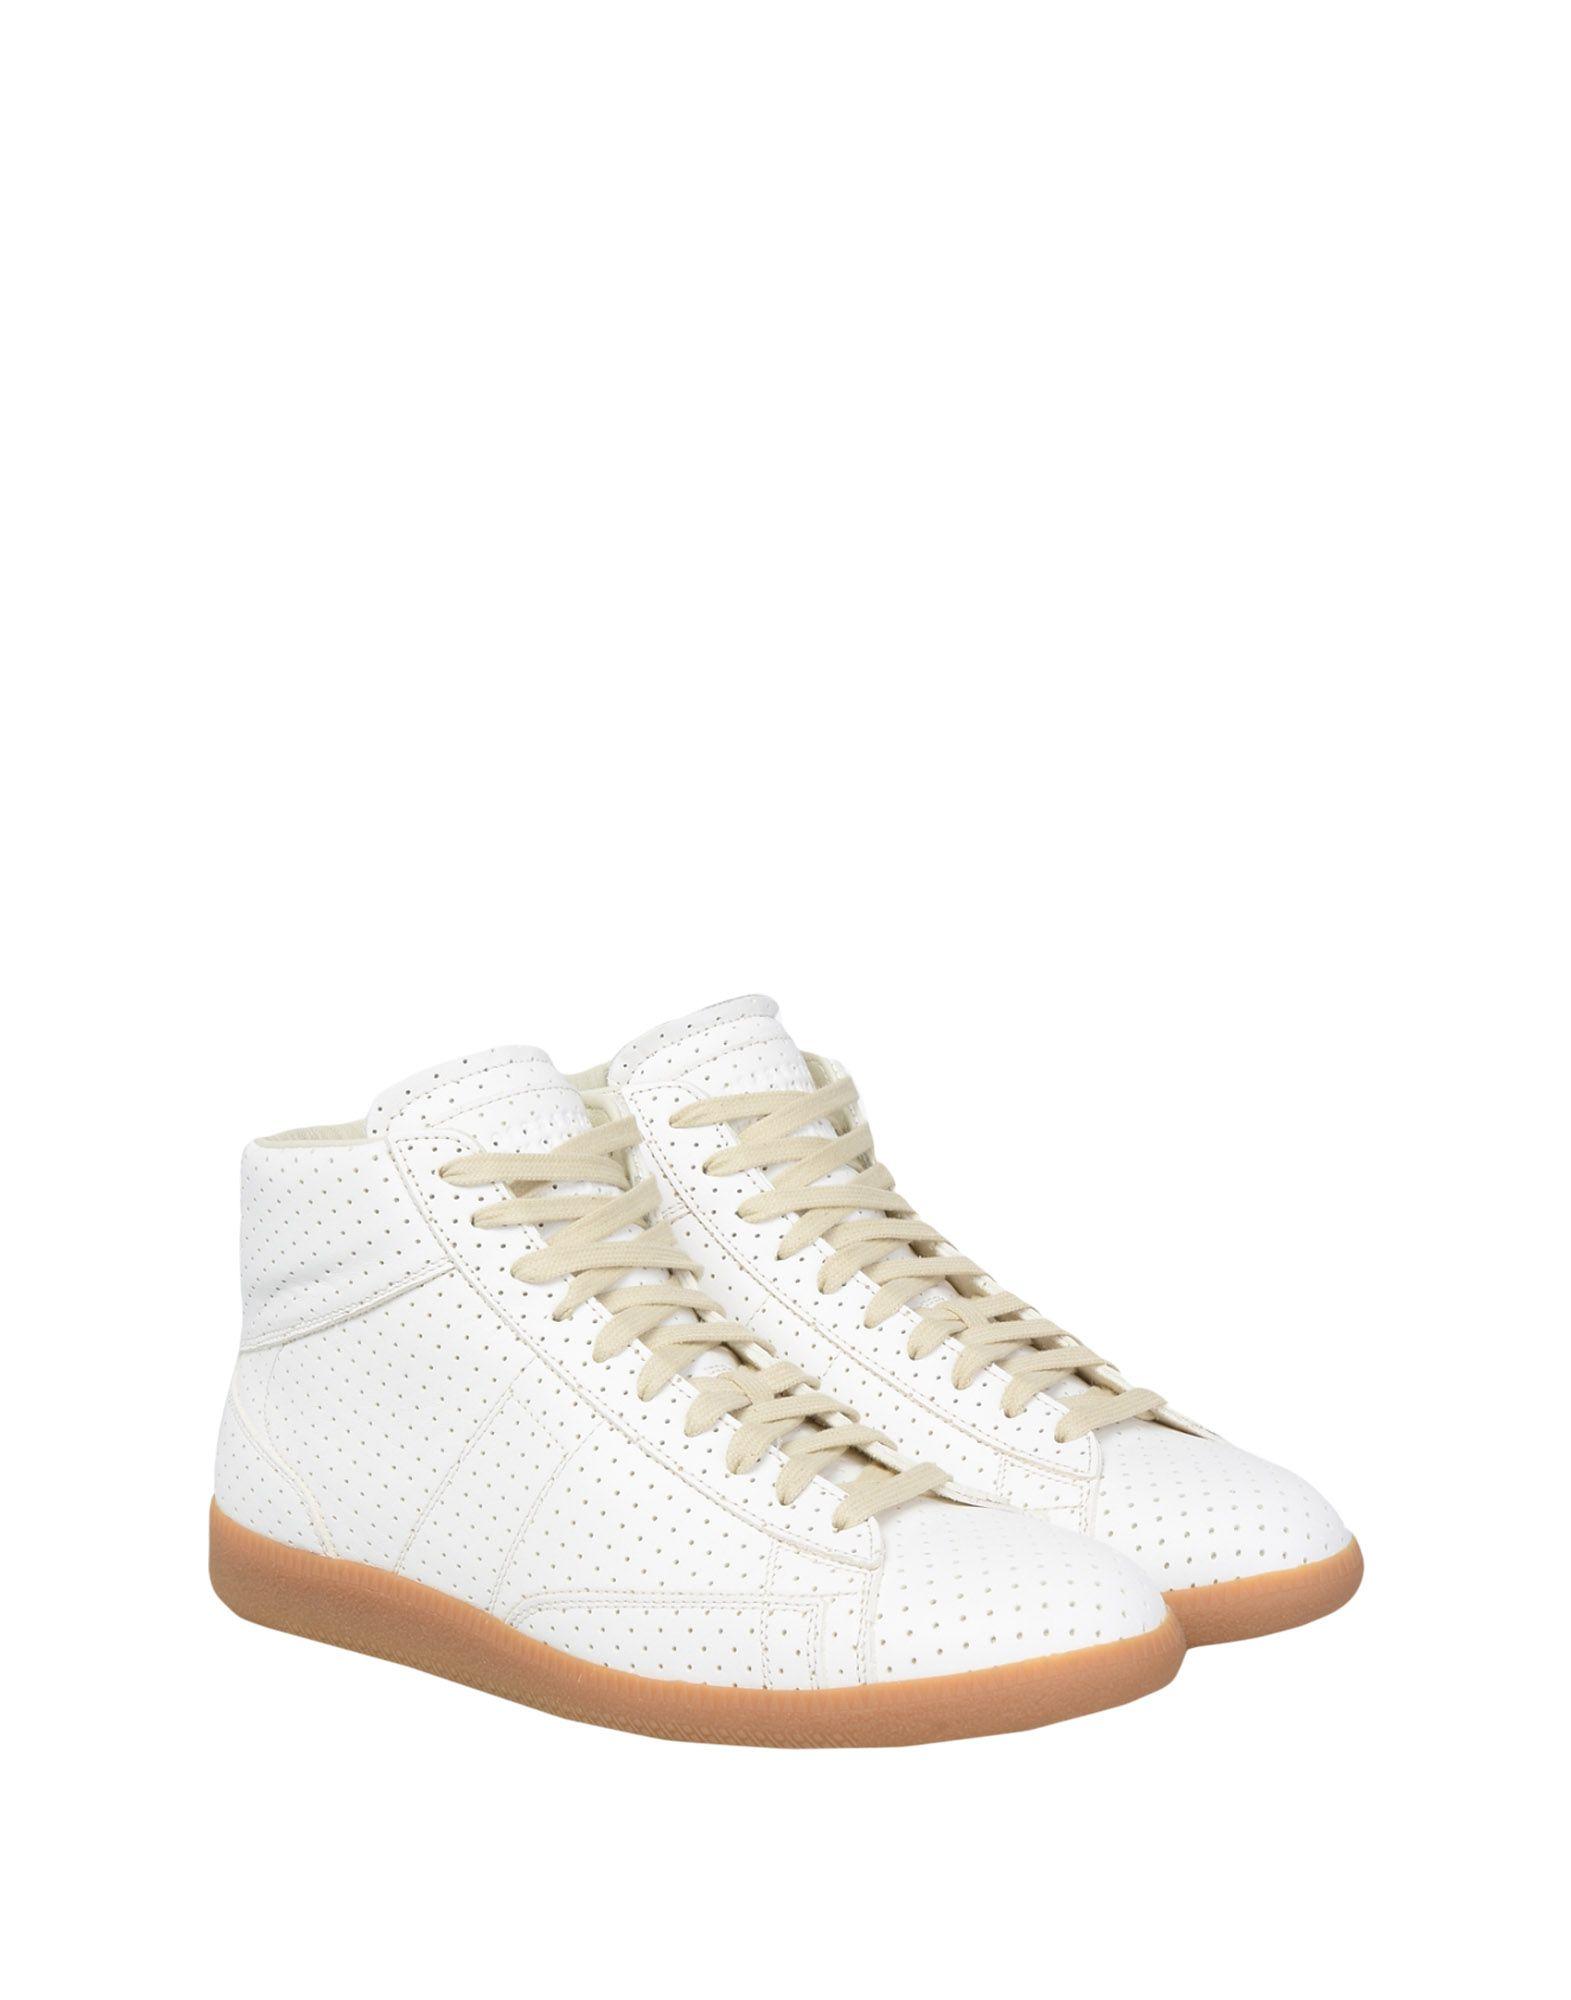 Maison Margiela Sneakers Herren  11424913BJ Gute Qualität beliebte Schuhe